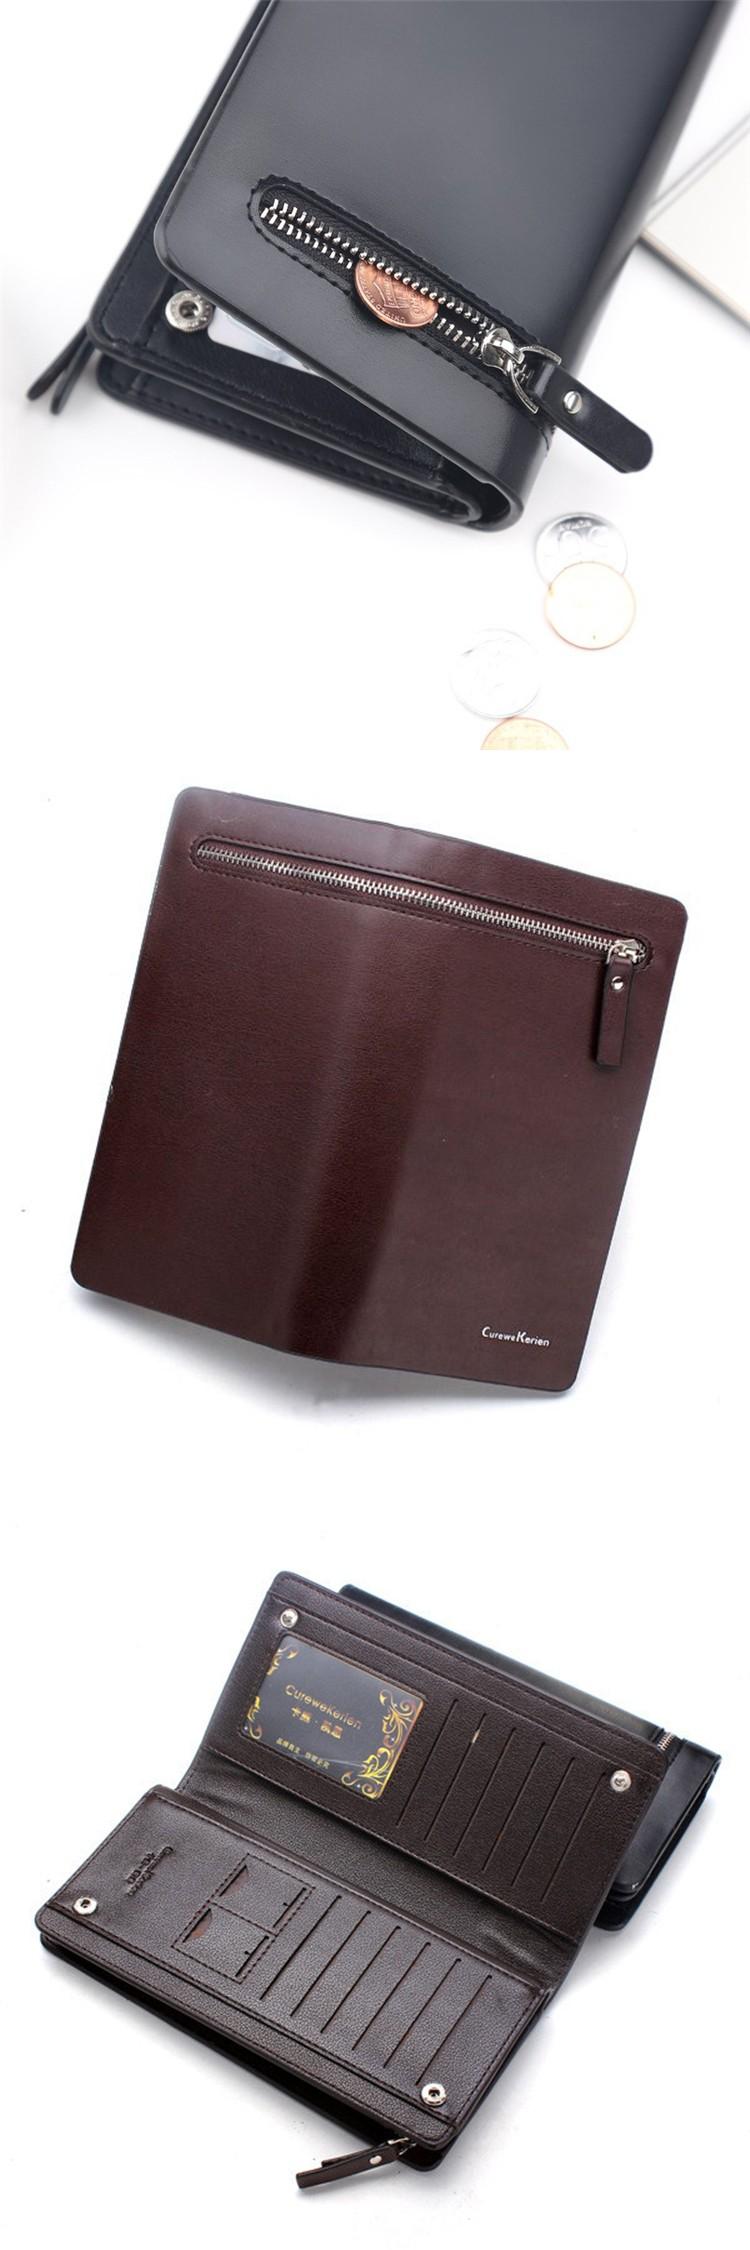 2016 Wallet Mens Pu Leather Long Zipper Purse Business Style Curewe Dompet Fashion Kerien 008 009 010 011